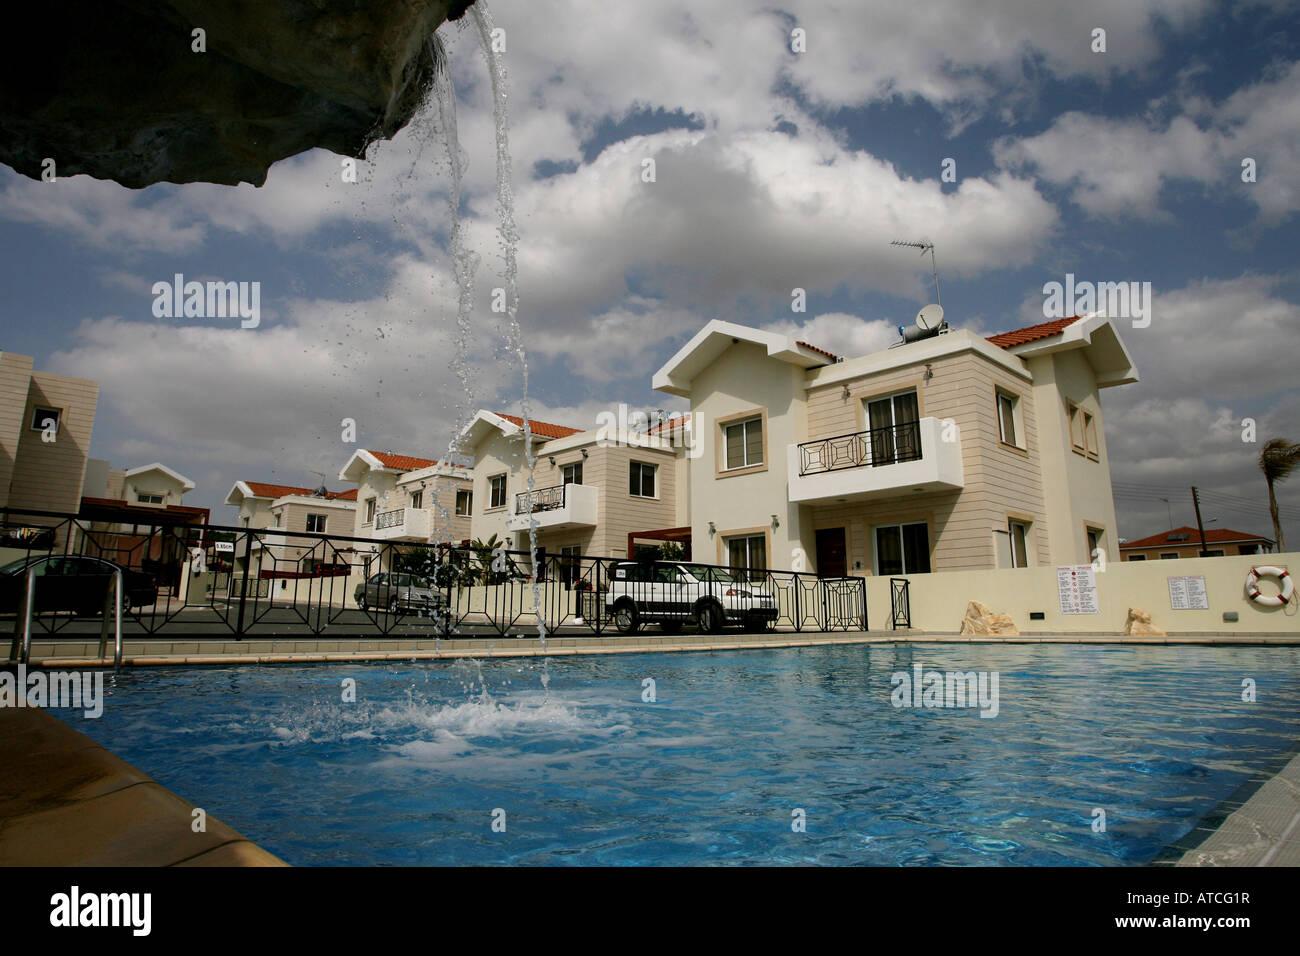 Holiday Homes And Apartments And A Swimming Pool At Pyla Near Larnaca Stock Photo Royalty Free